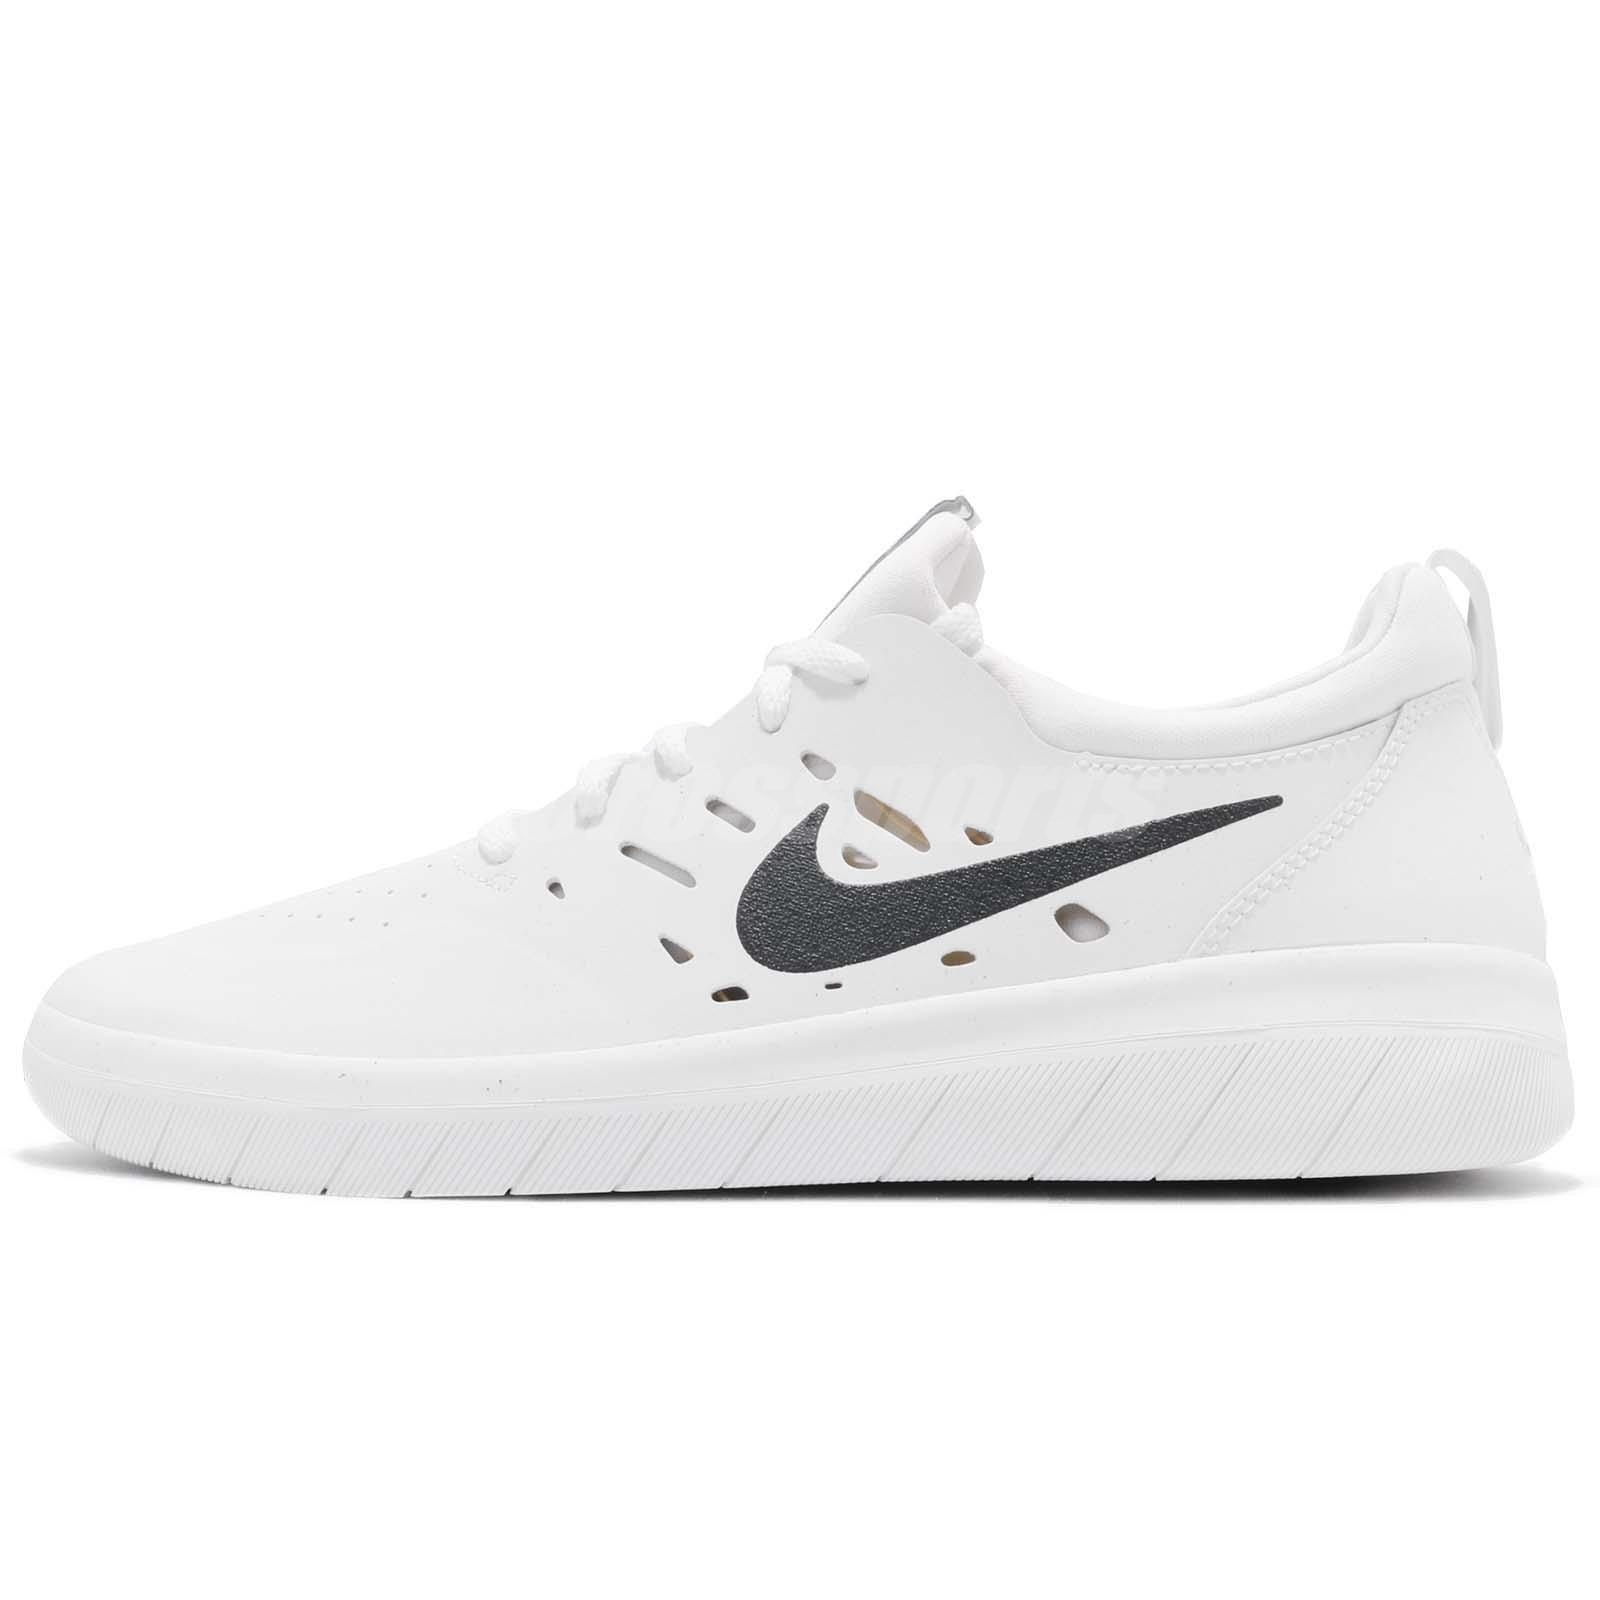 6a11daf645c51 Nike SB Nyjah Free Huston White Til Death Men Skateboarding Shoes AA4272-100